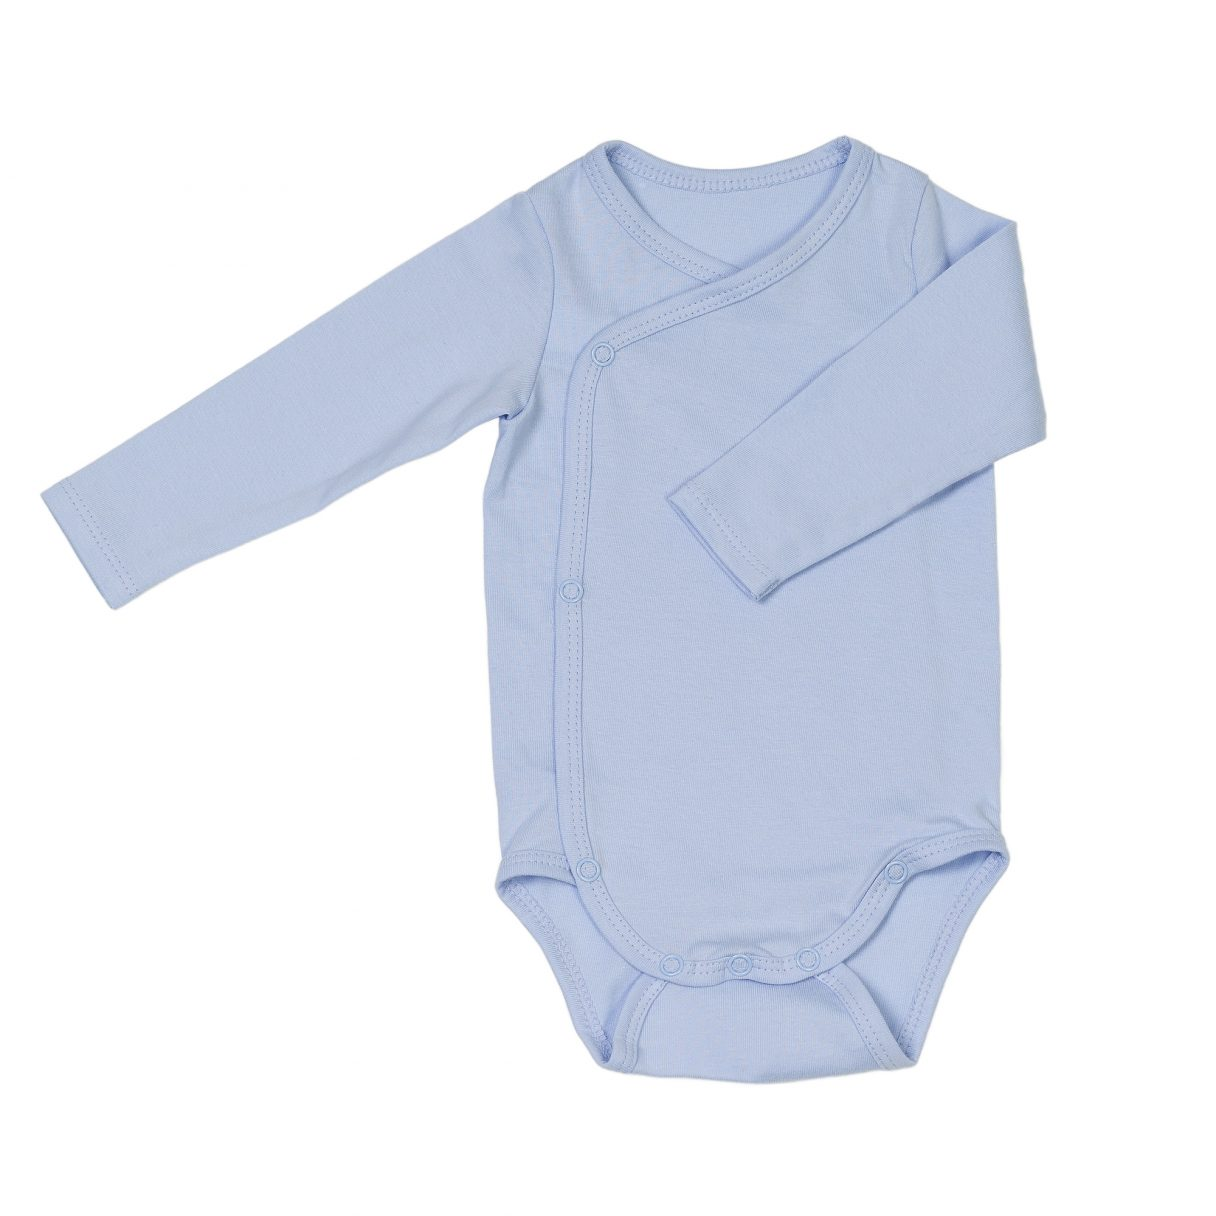 Newborn organic cotton baby bodysuit blue